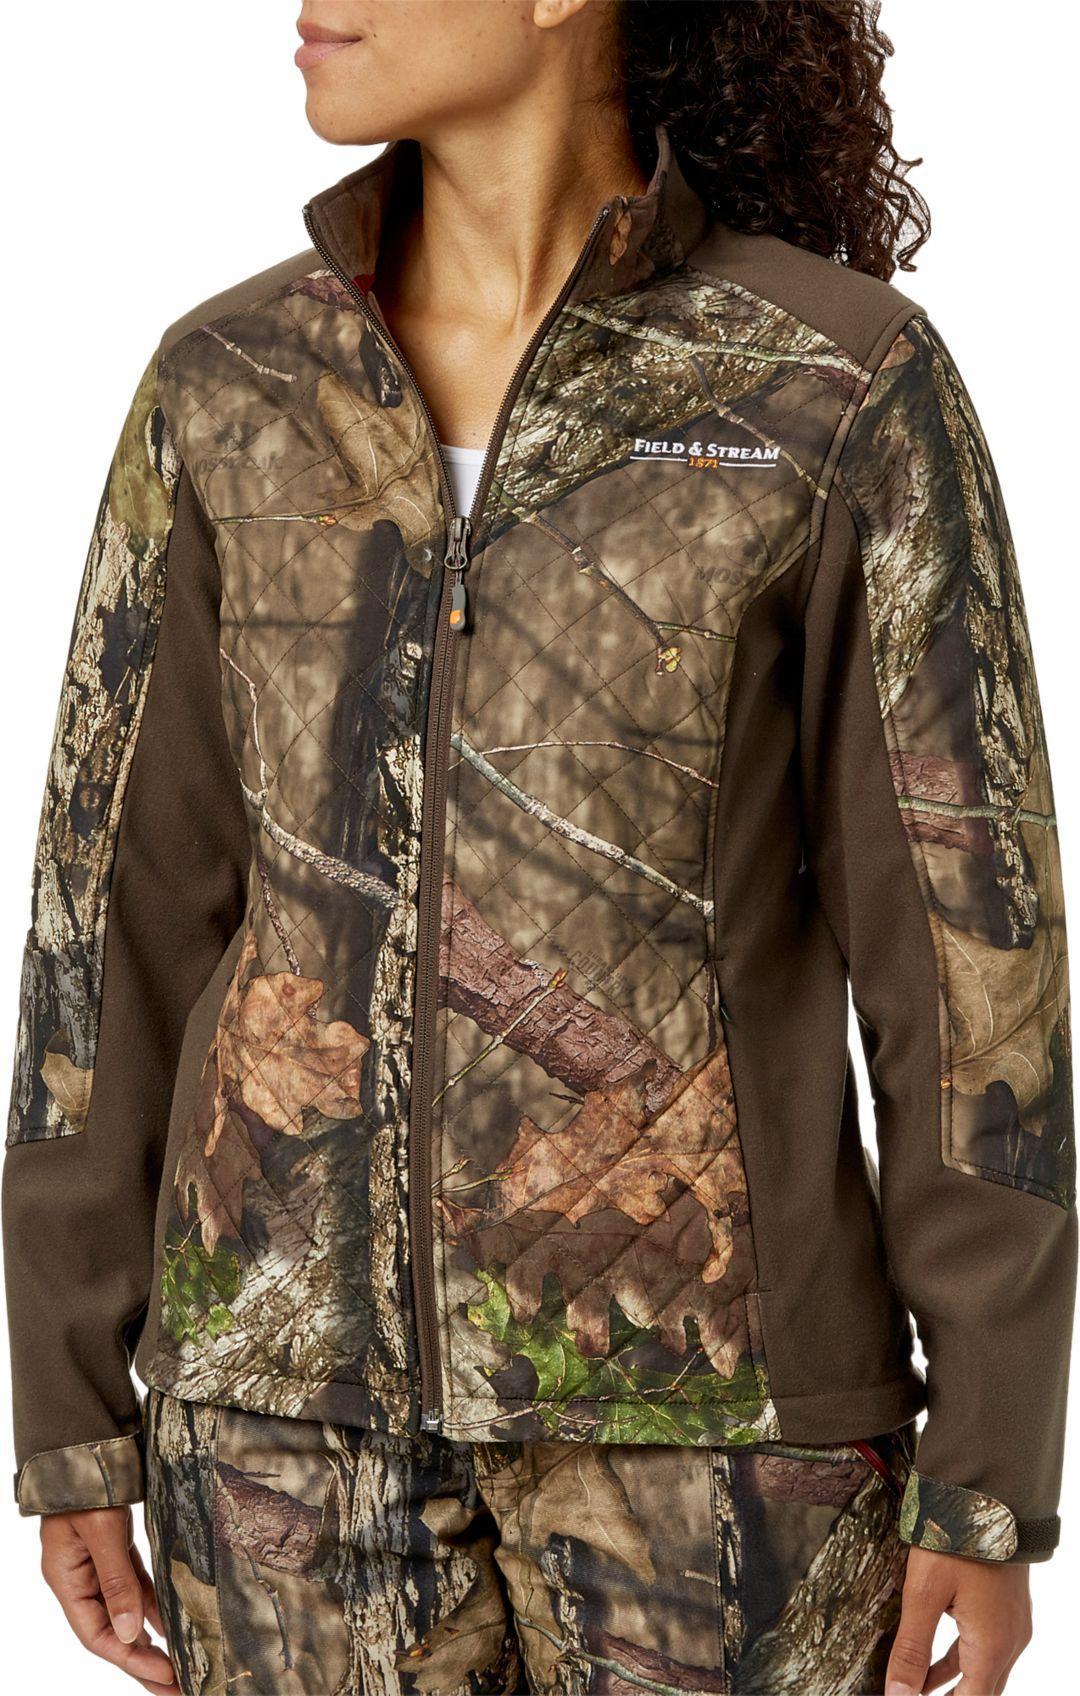 c8fdfbf7df18b Field & Stream Women's Every Hunt Insulated Softshell Jacket ...